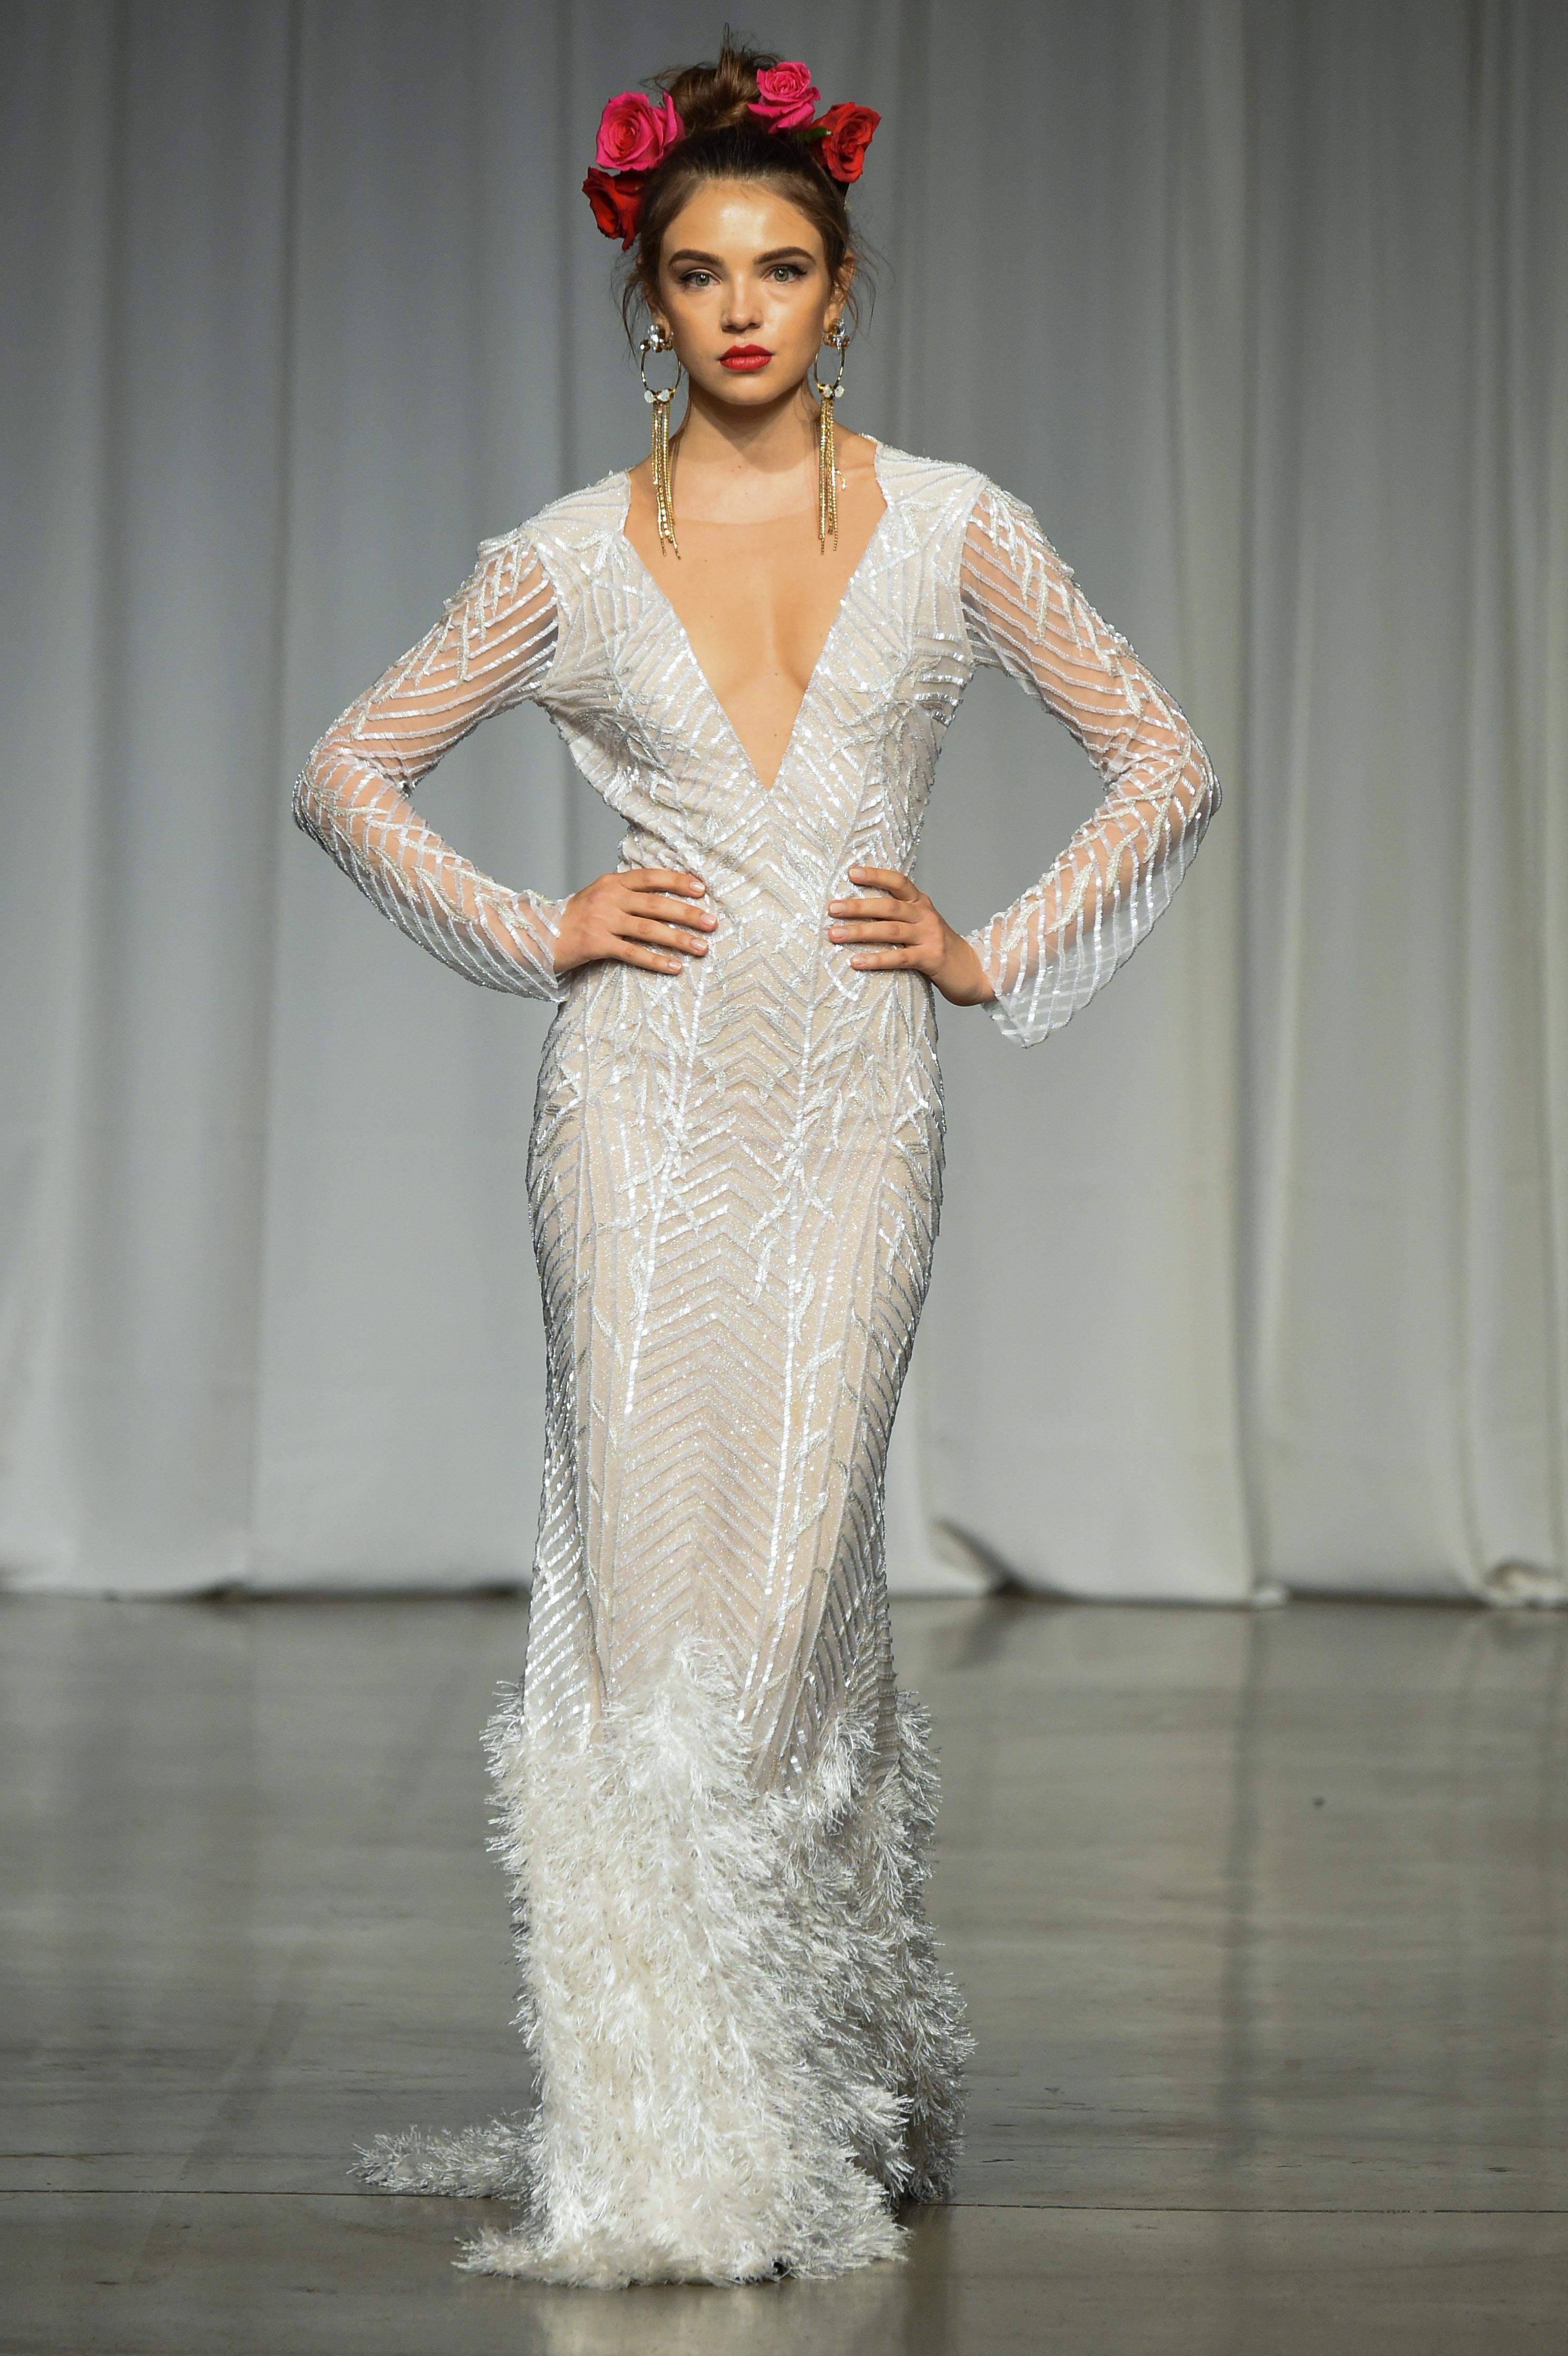 julie vino group fall 2019 sheath v-neck long sleeve wedding dress